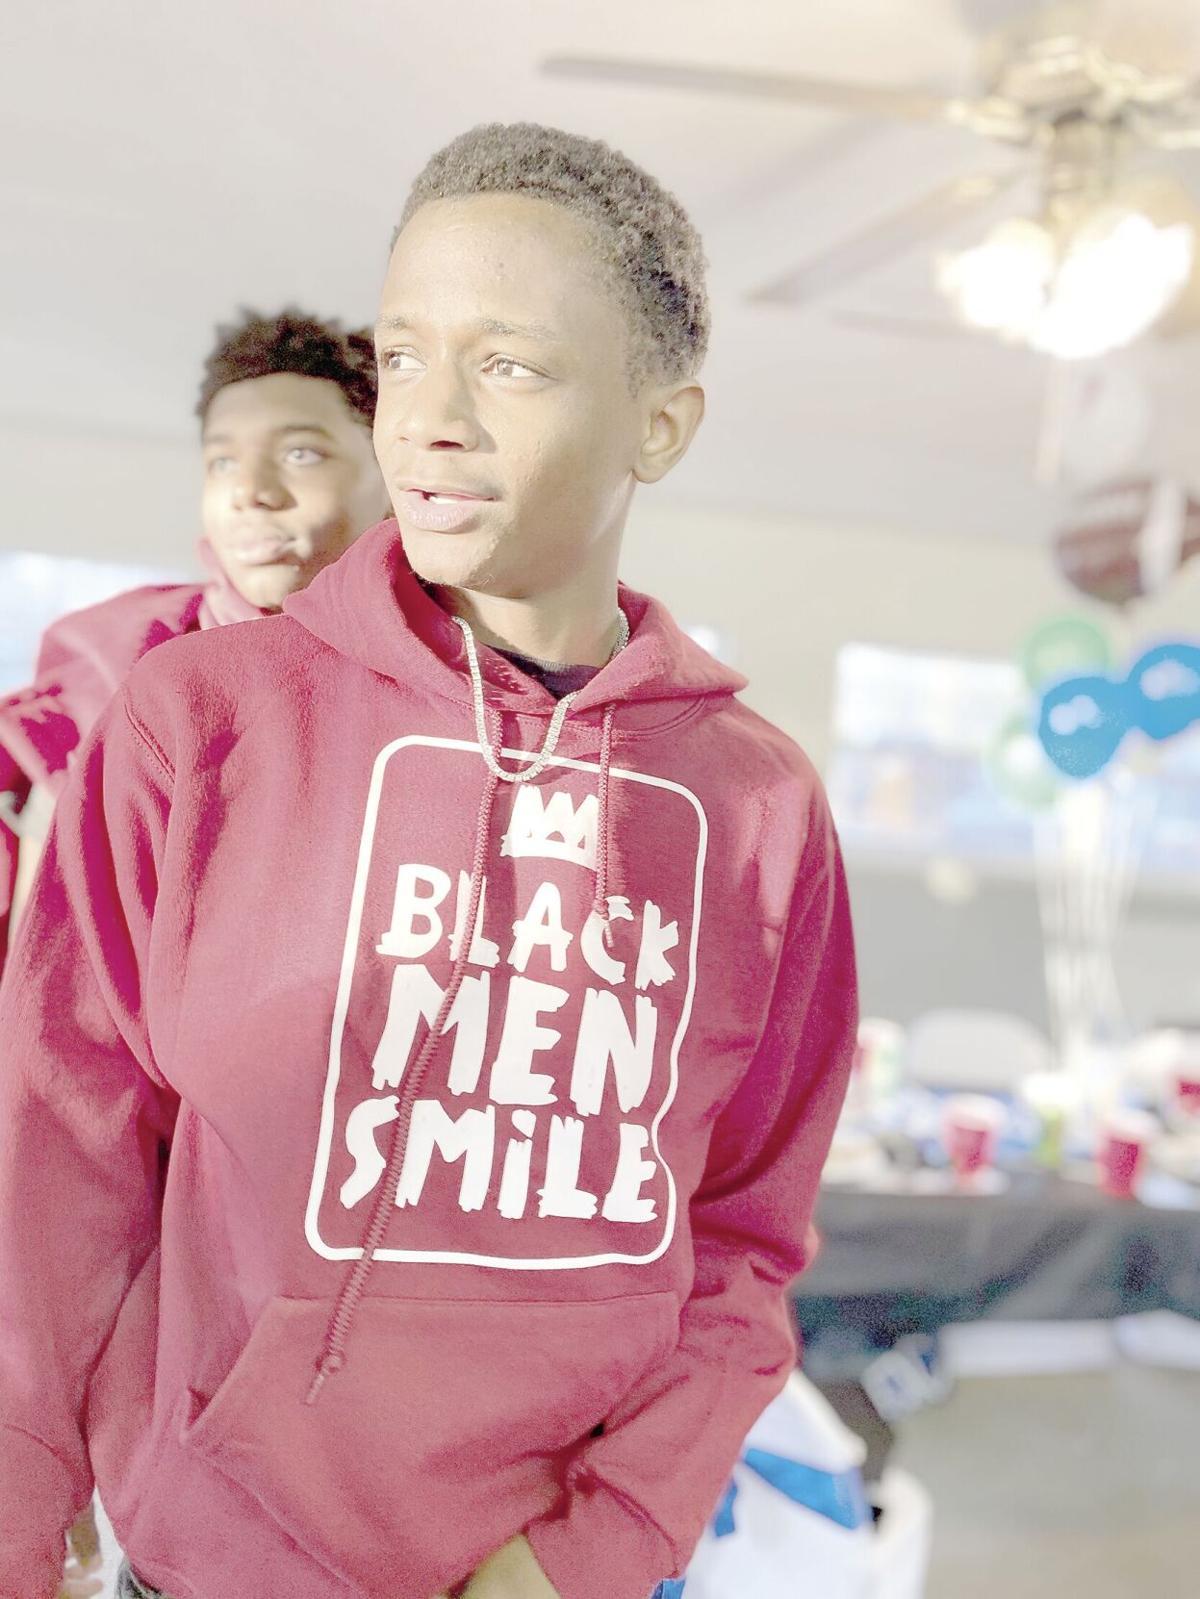 Black Men Smile